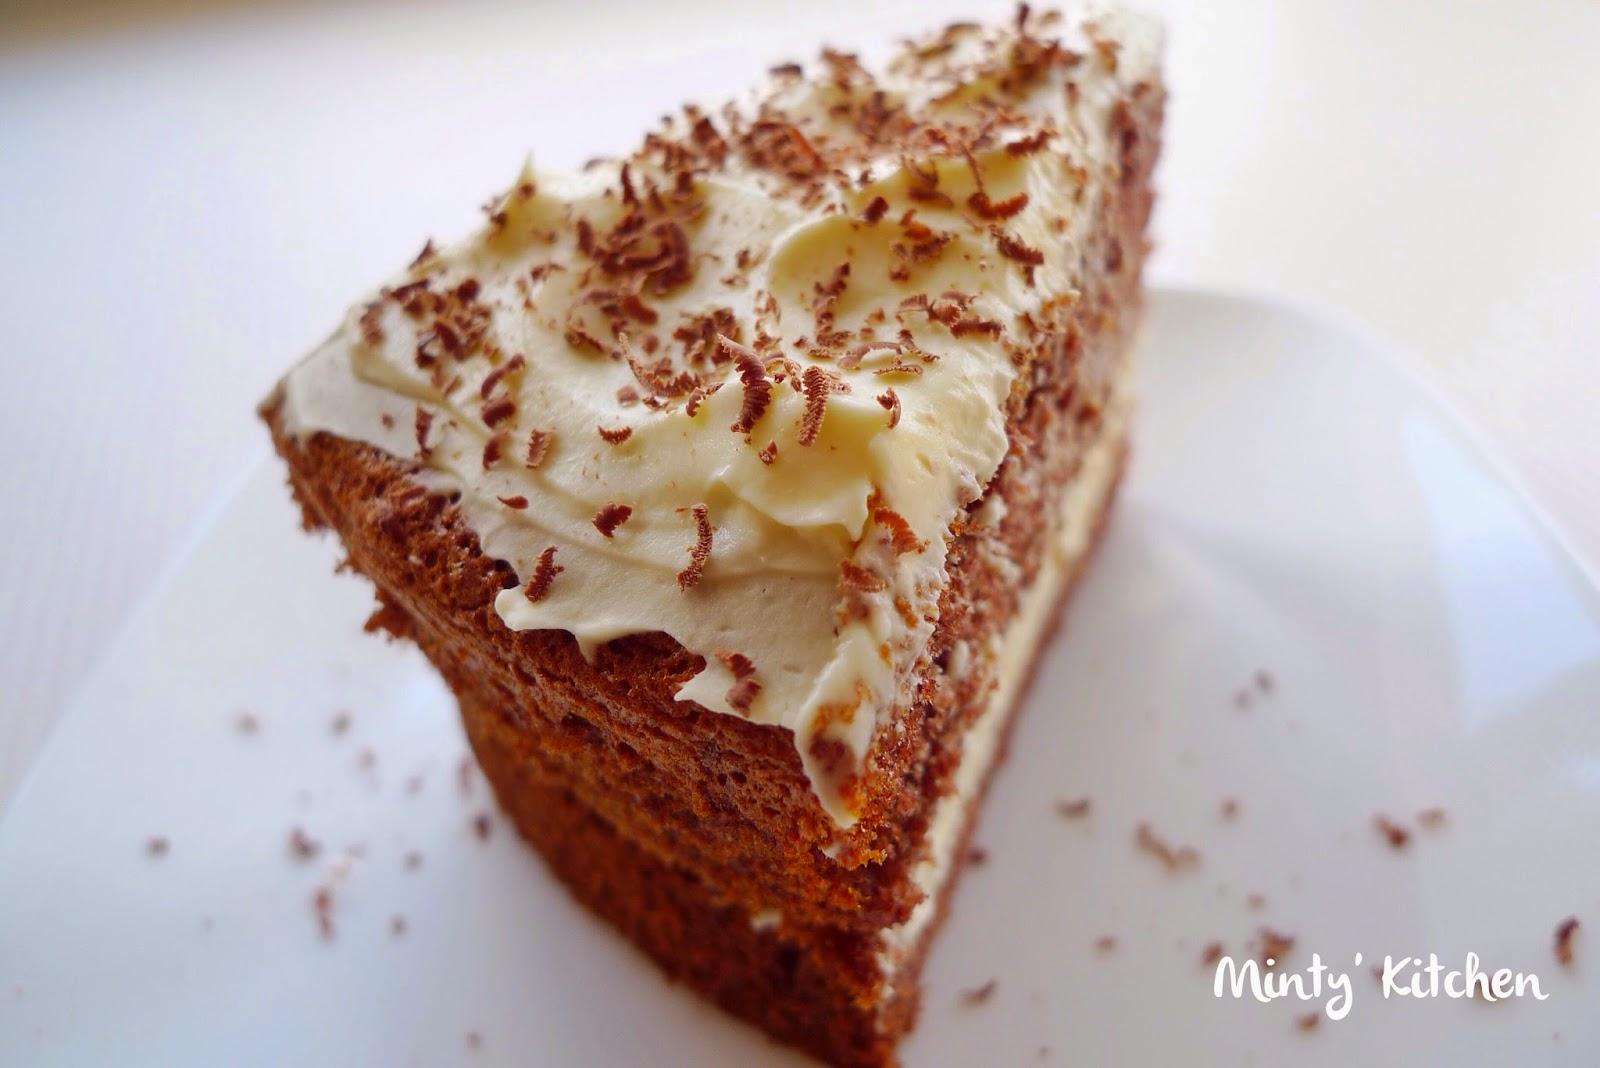 Minty's Kitchen: Chocolate Sponge Cake With Cream Cheese